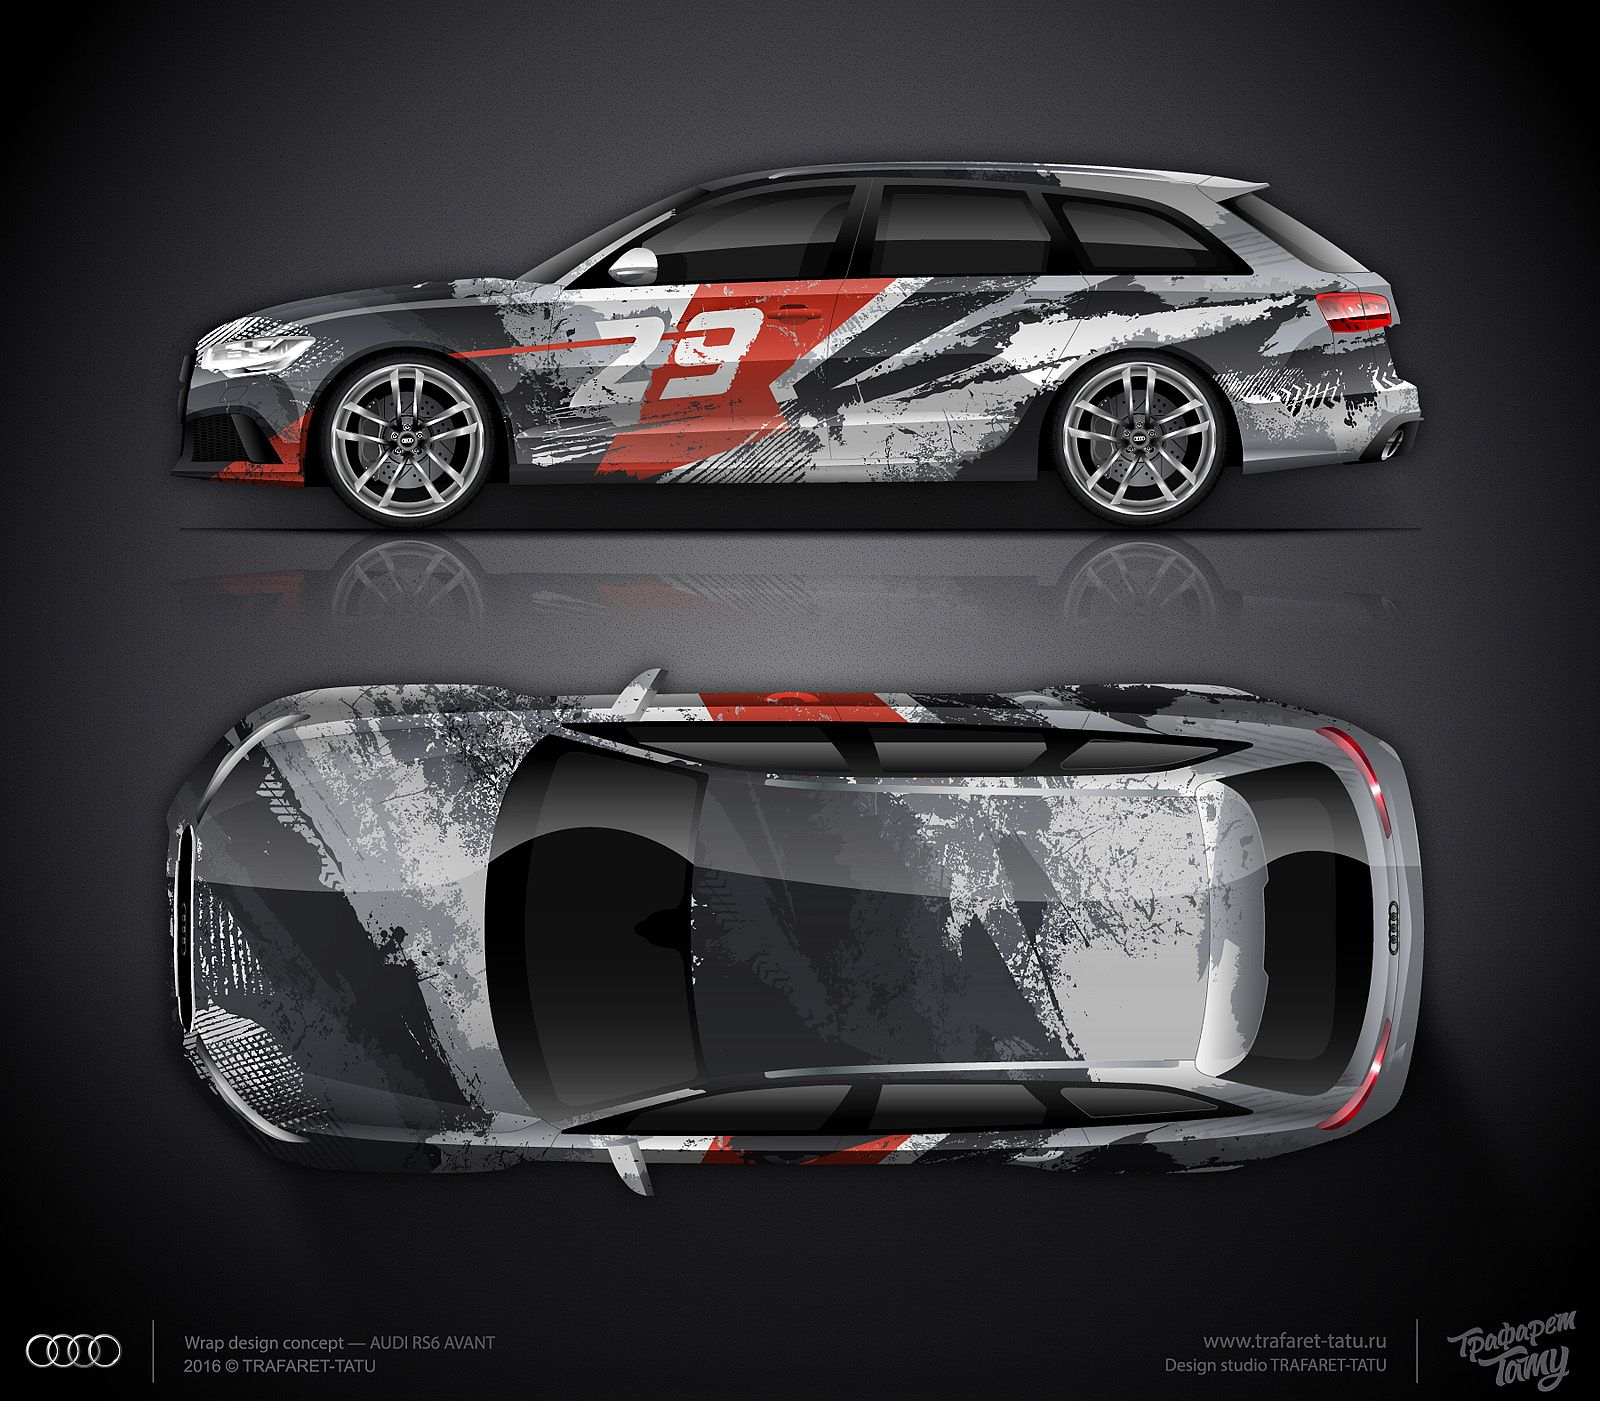 Car sticker design for sale - Design Concept 13 For Audi Rs6 Avant For Sale Car Stickersdesign